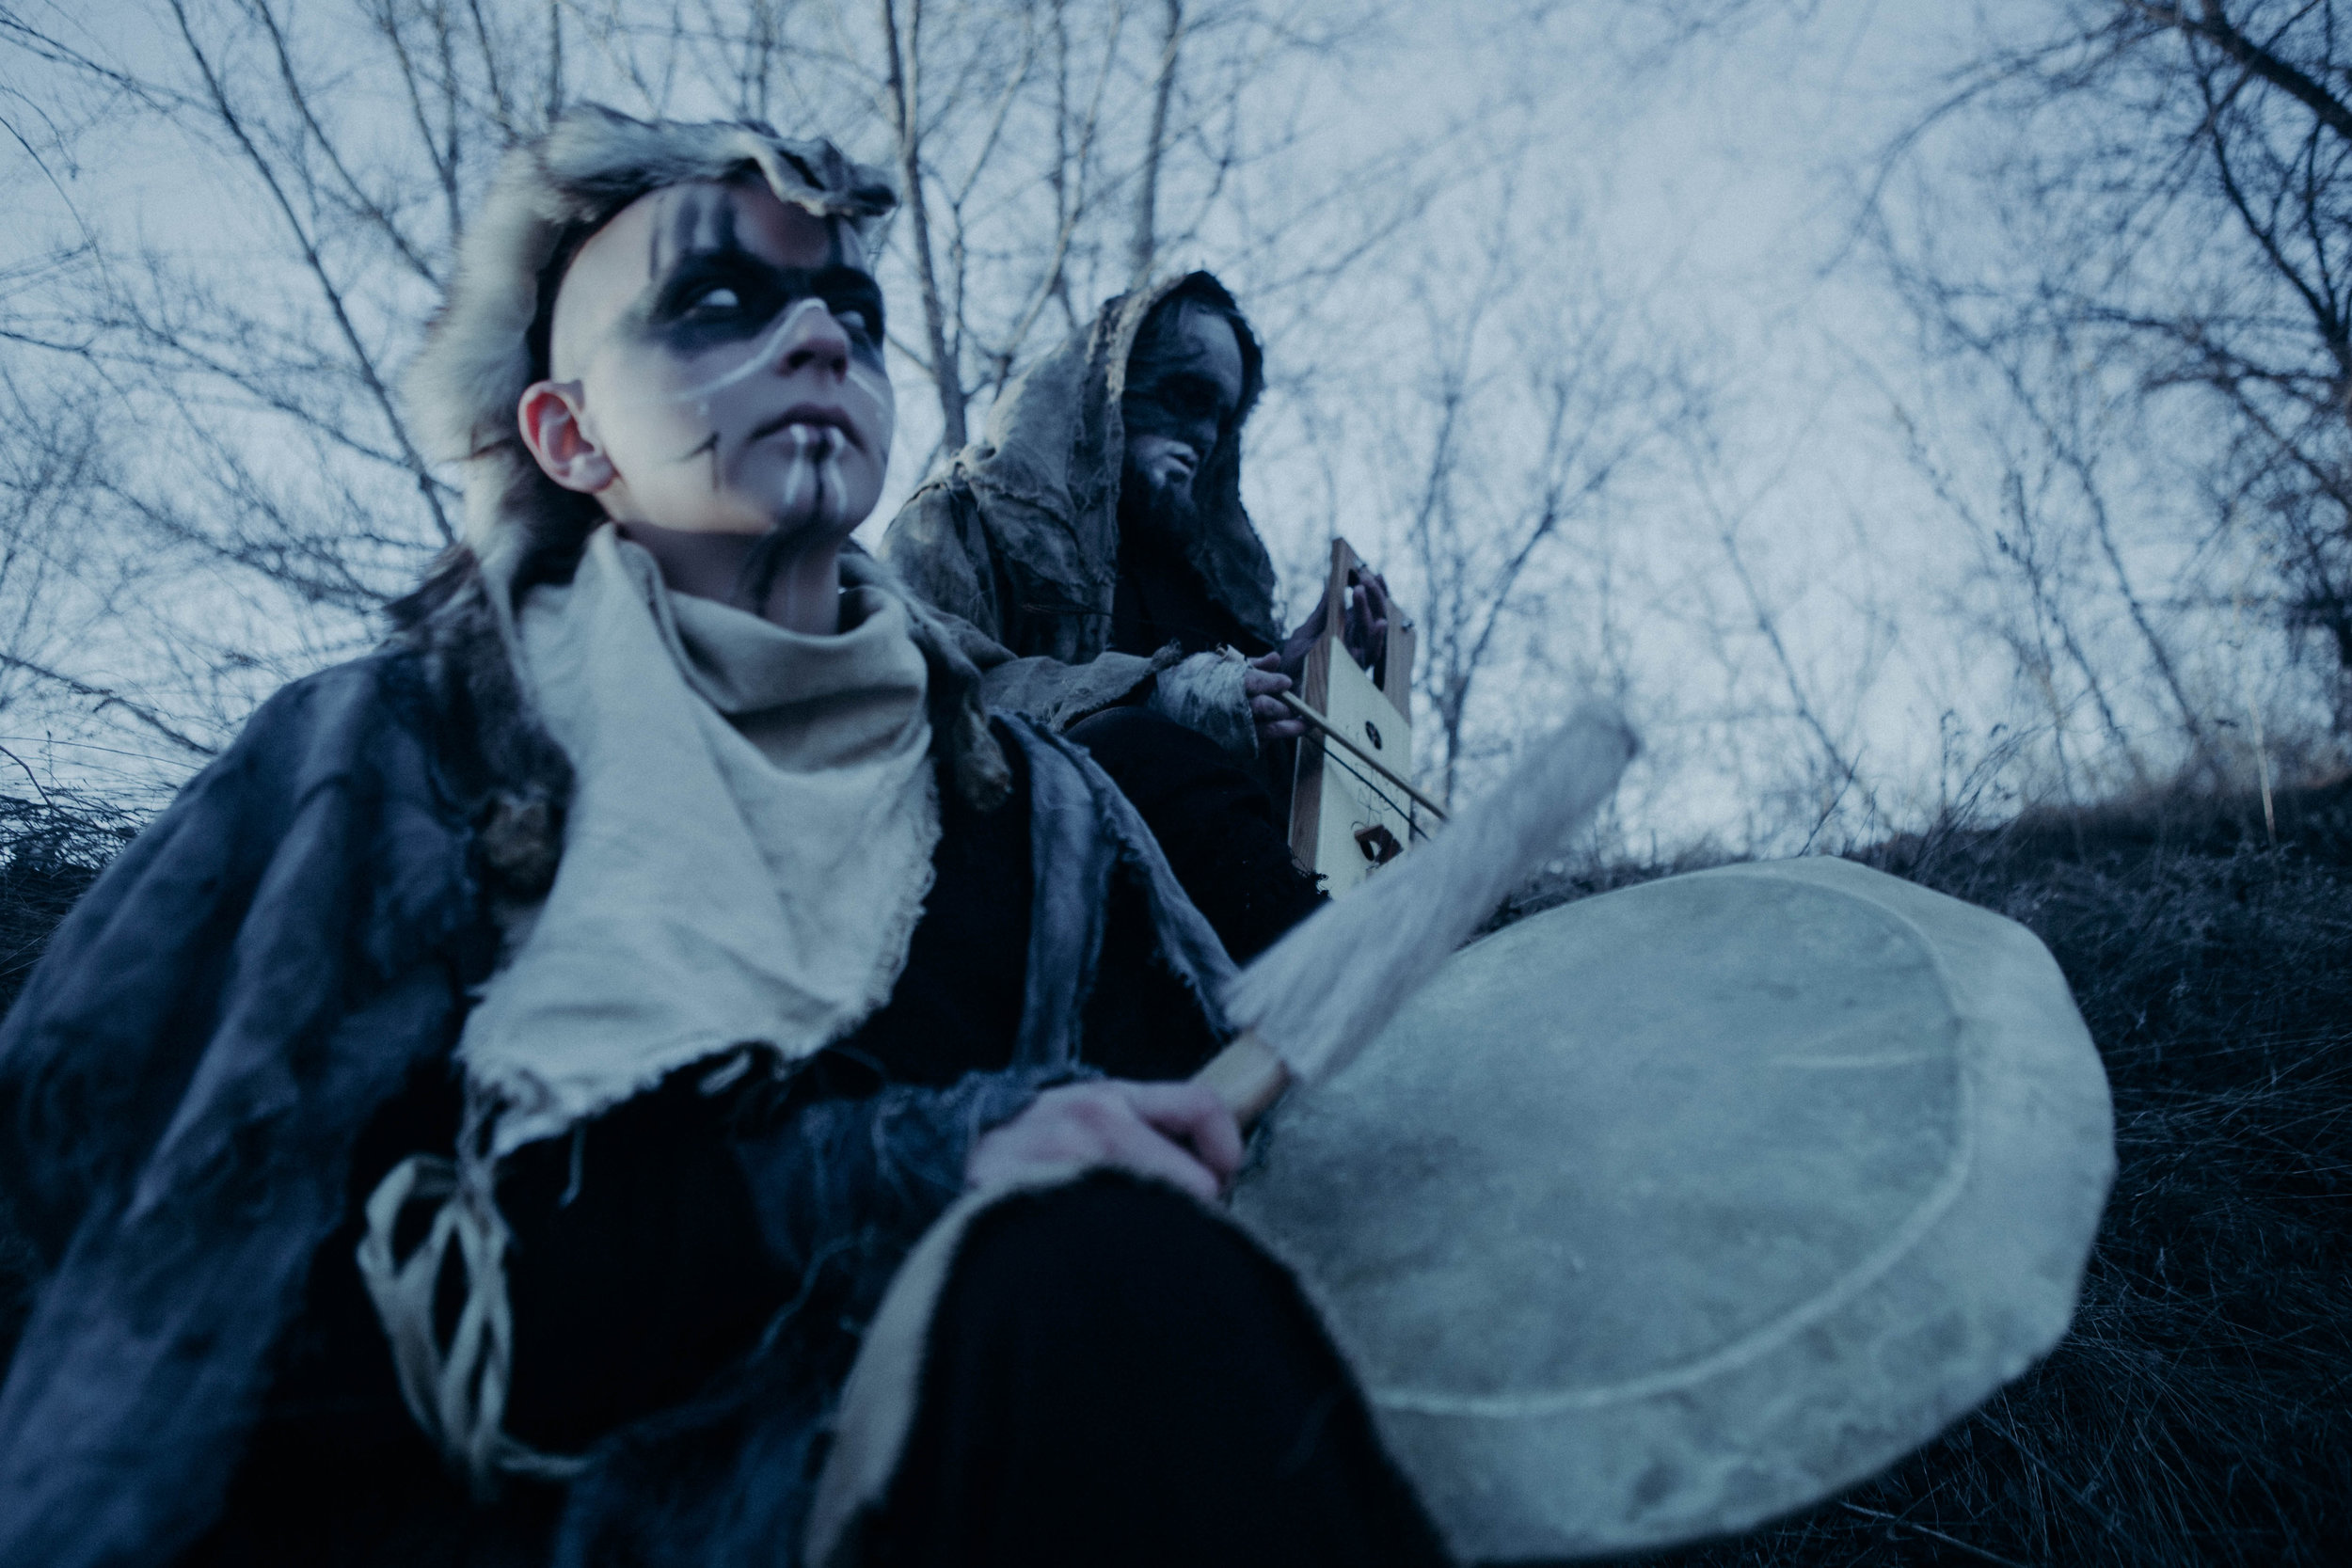 Nytt Land - RUS // Dark Epic Folk - Shamanic - Experimental13 settembre 2019 - h 22.00